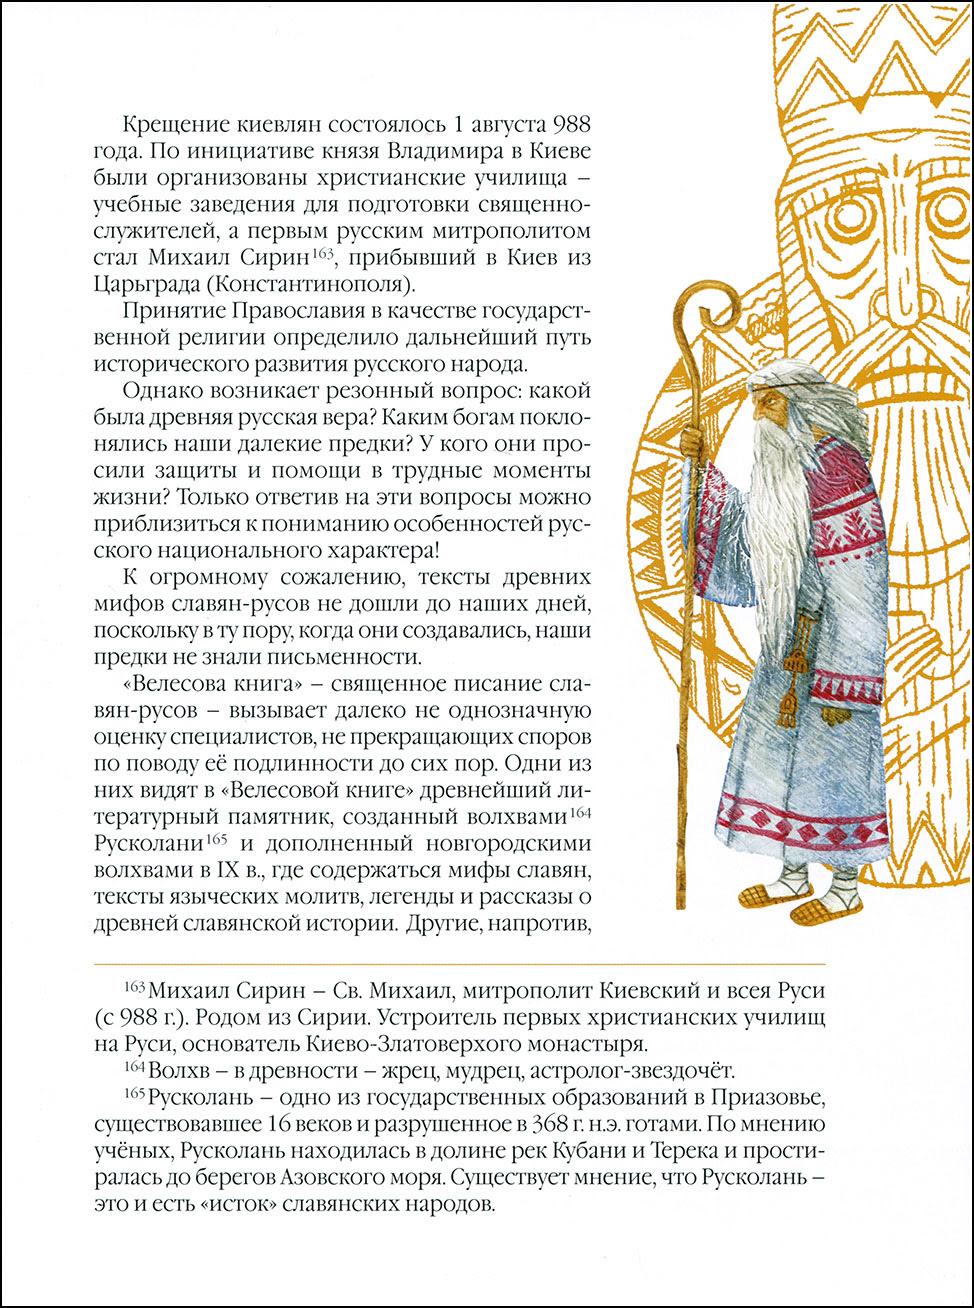 Мария Спехова, Как Егорка Алатырь искал